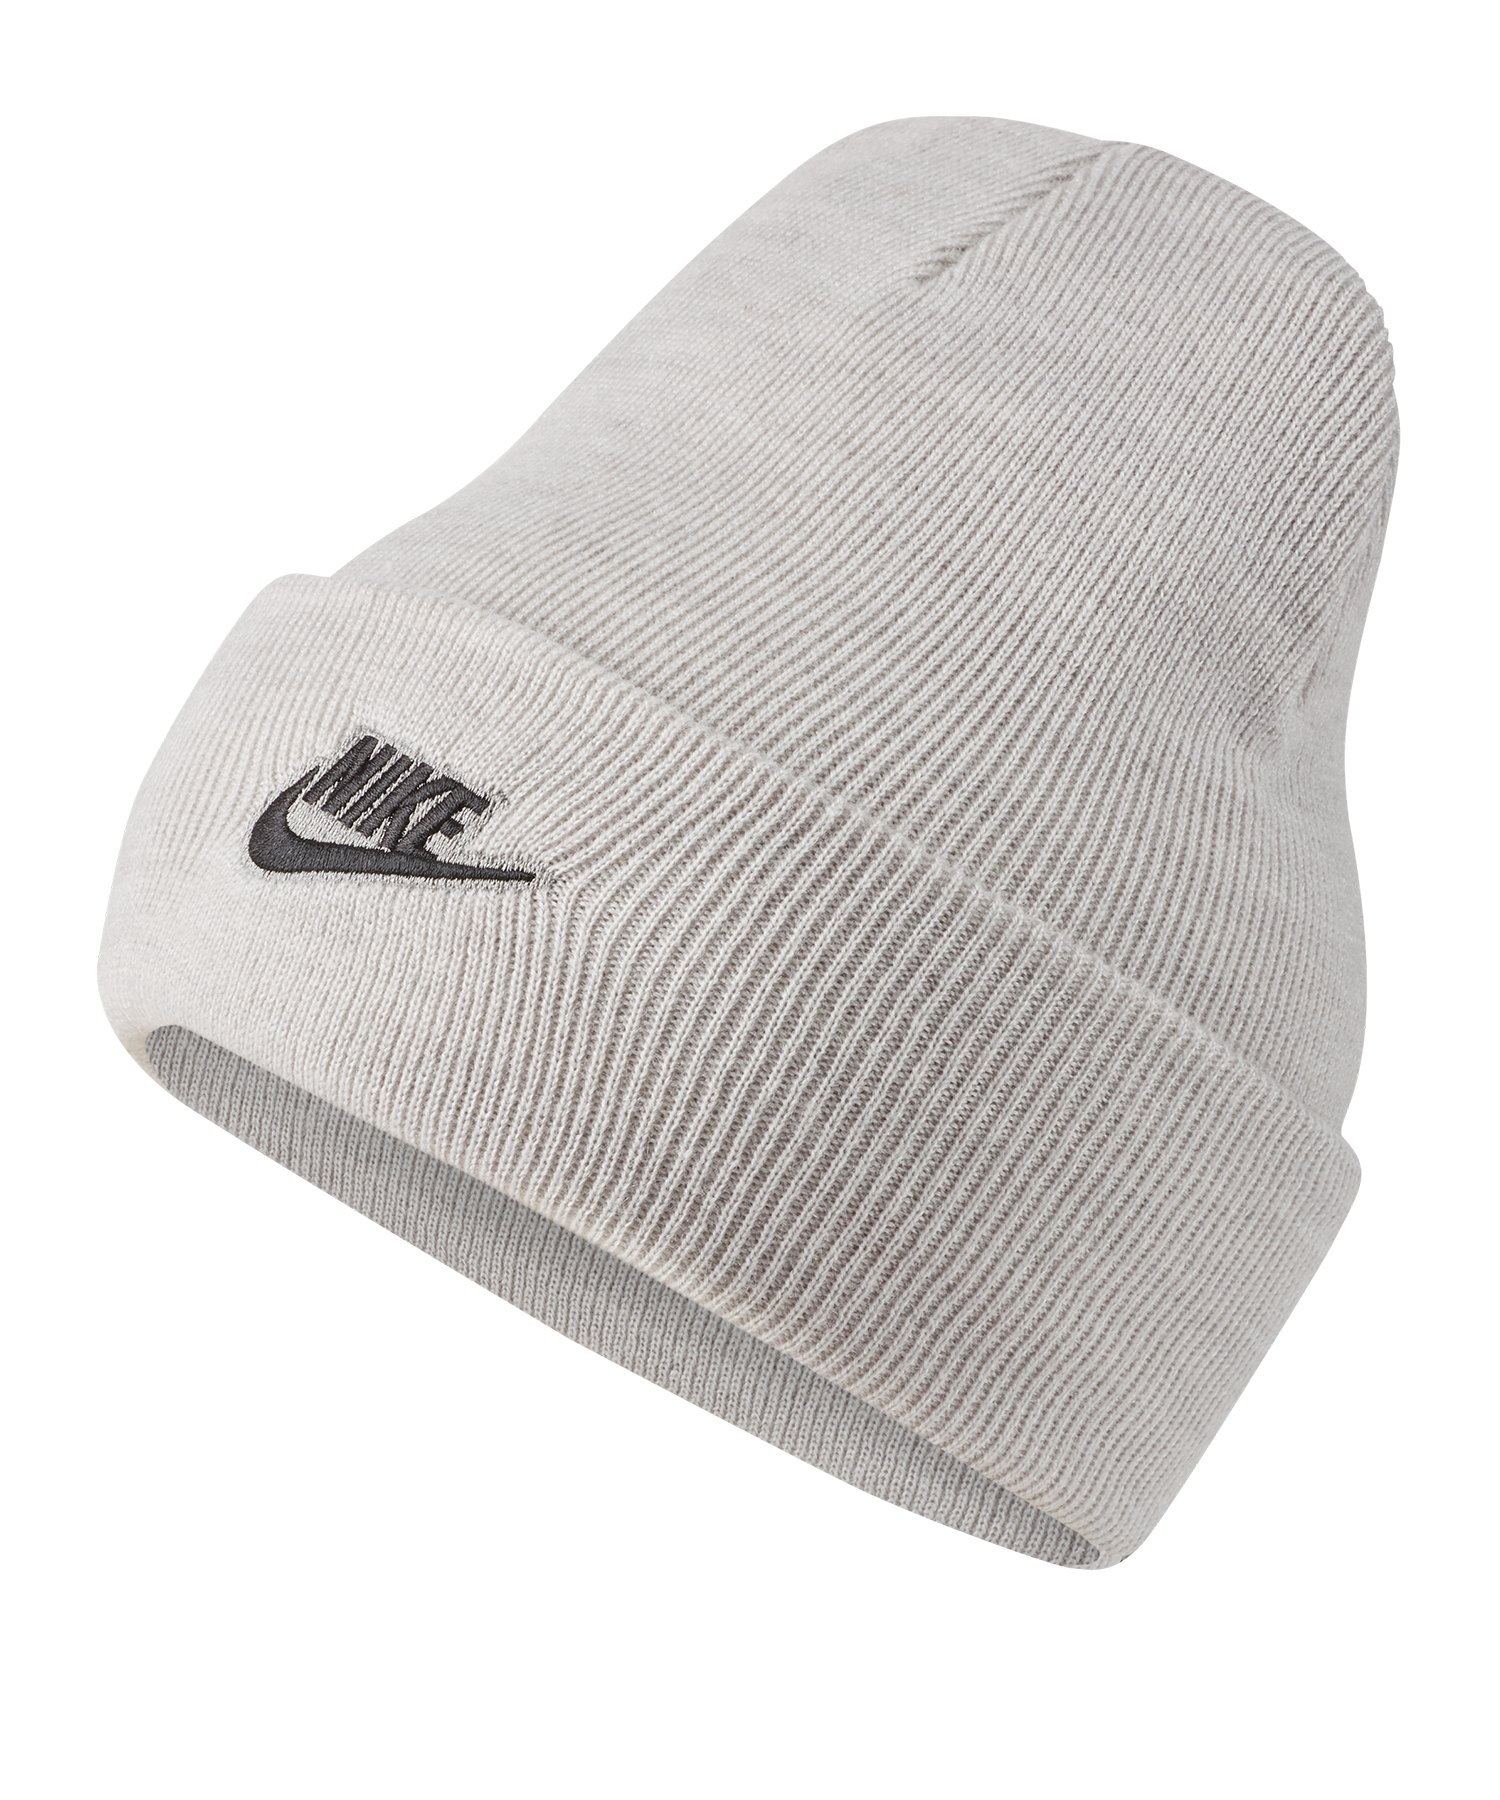 Nike Utility Cuffed Beanie Mütze Grau F050 - grau